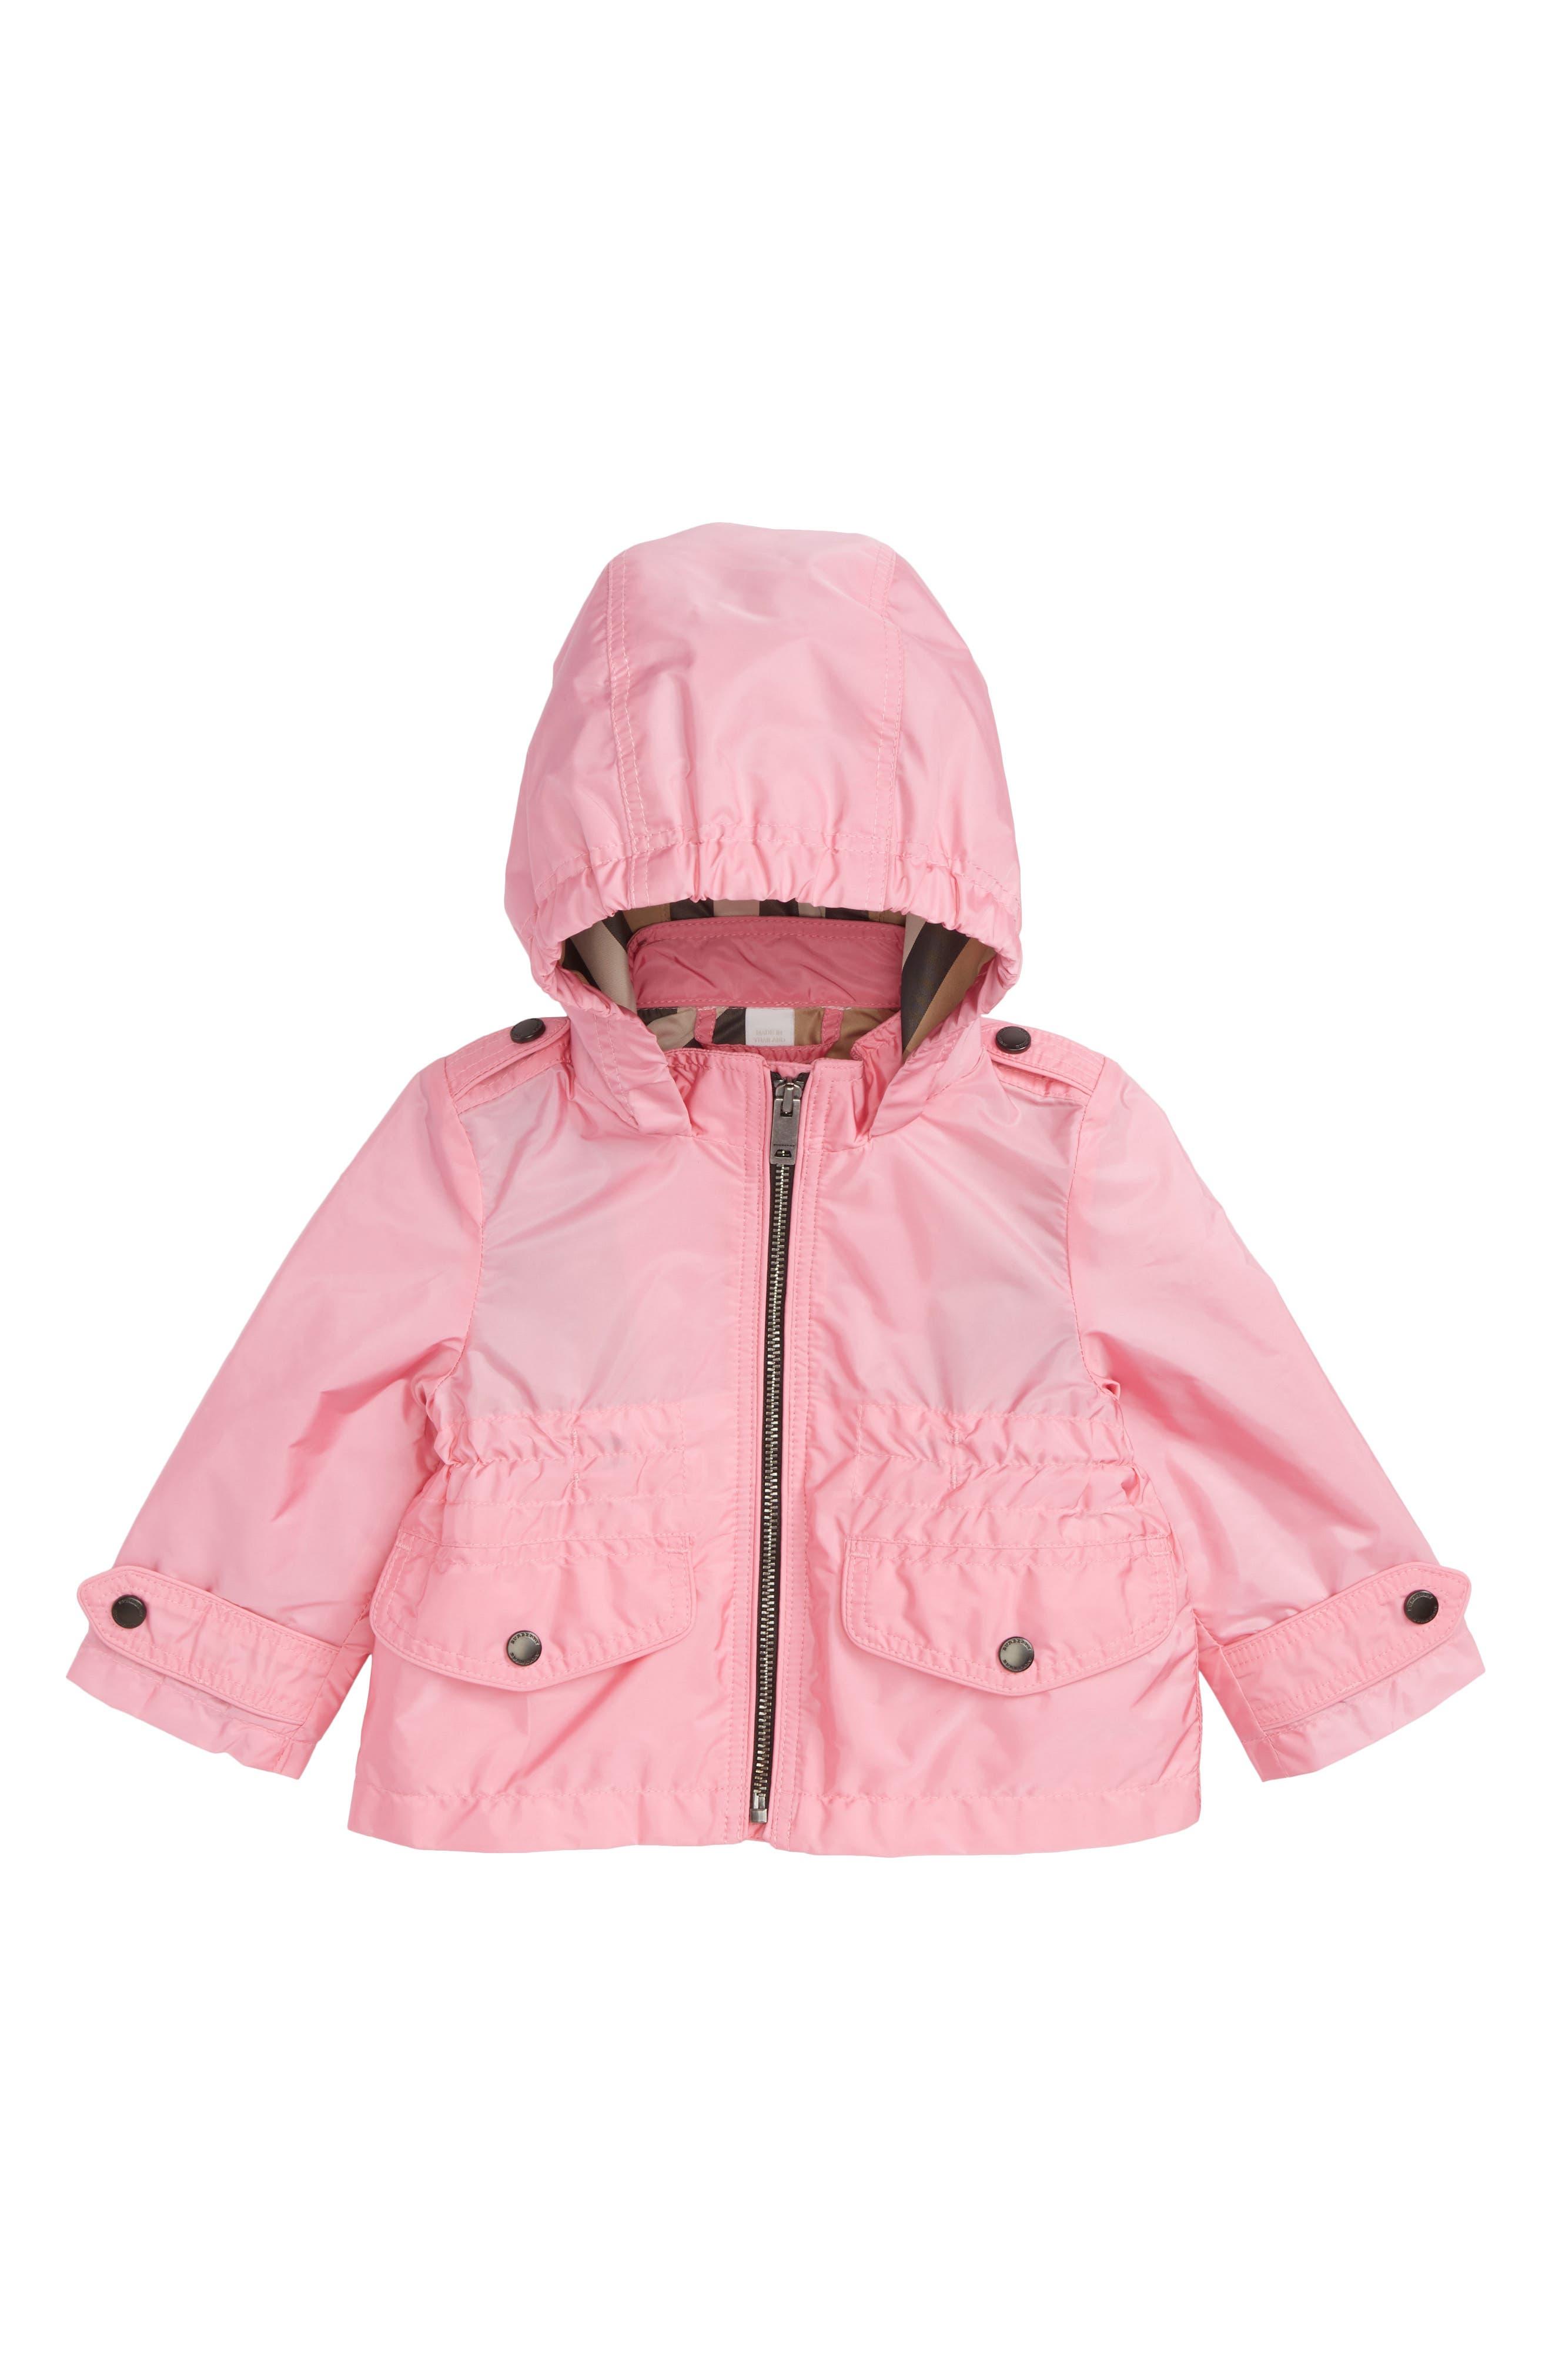 Mini Halle Hooded Packaway Rain Jacket,                         Main,                         color, 660